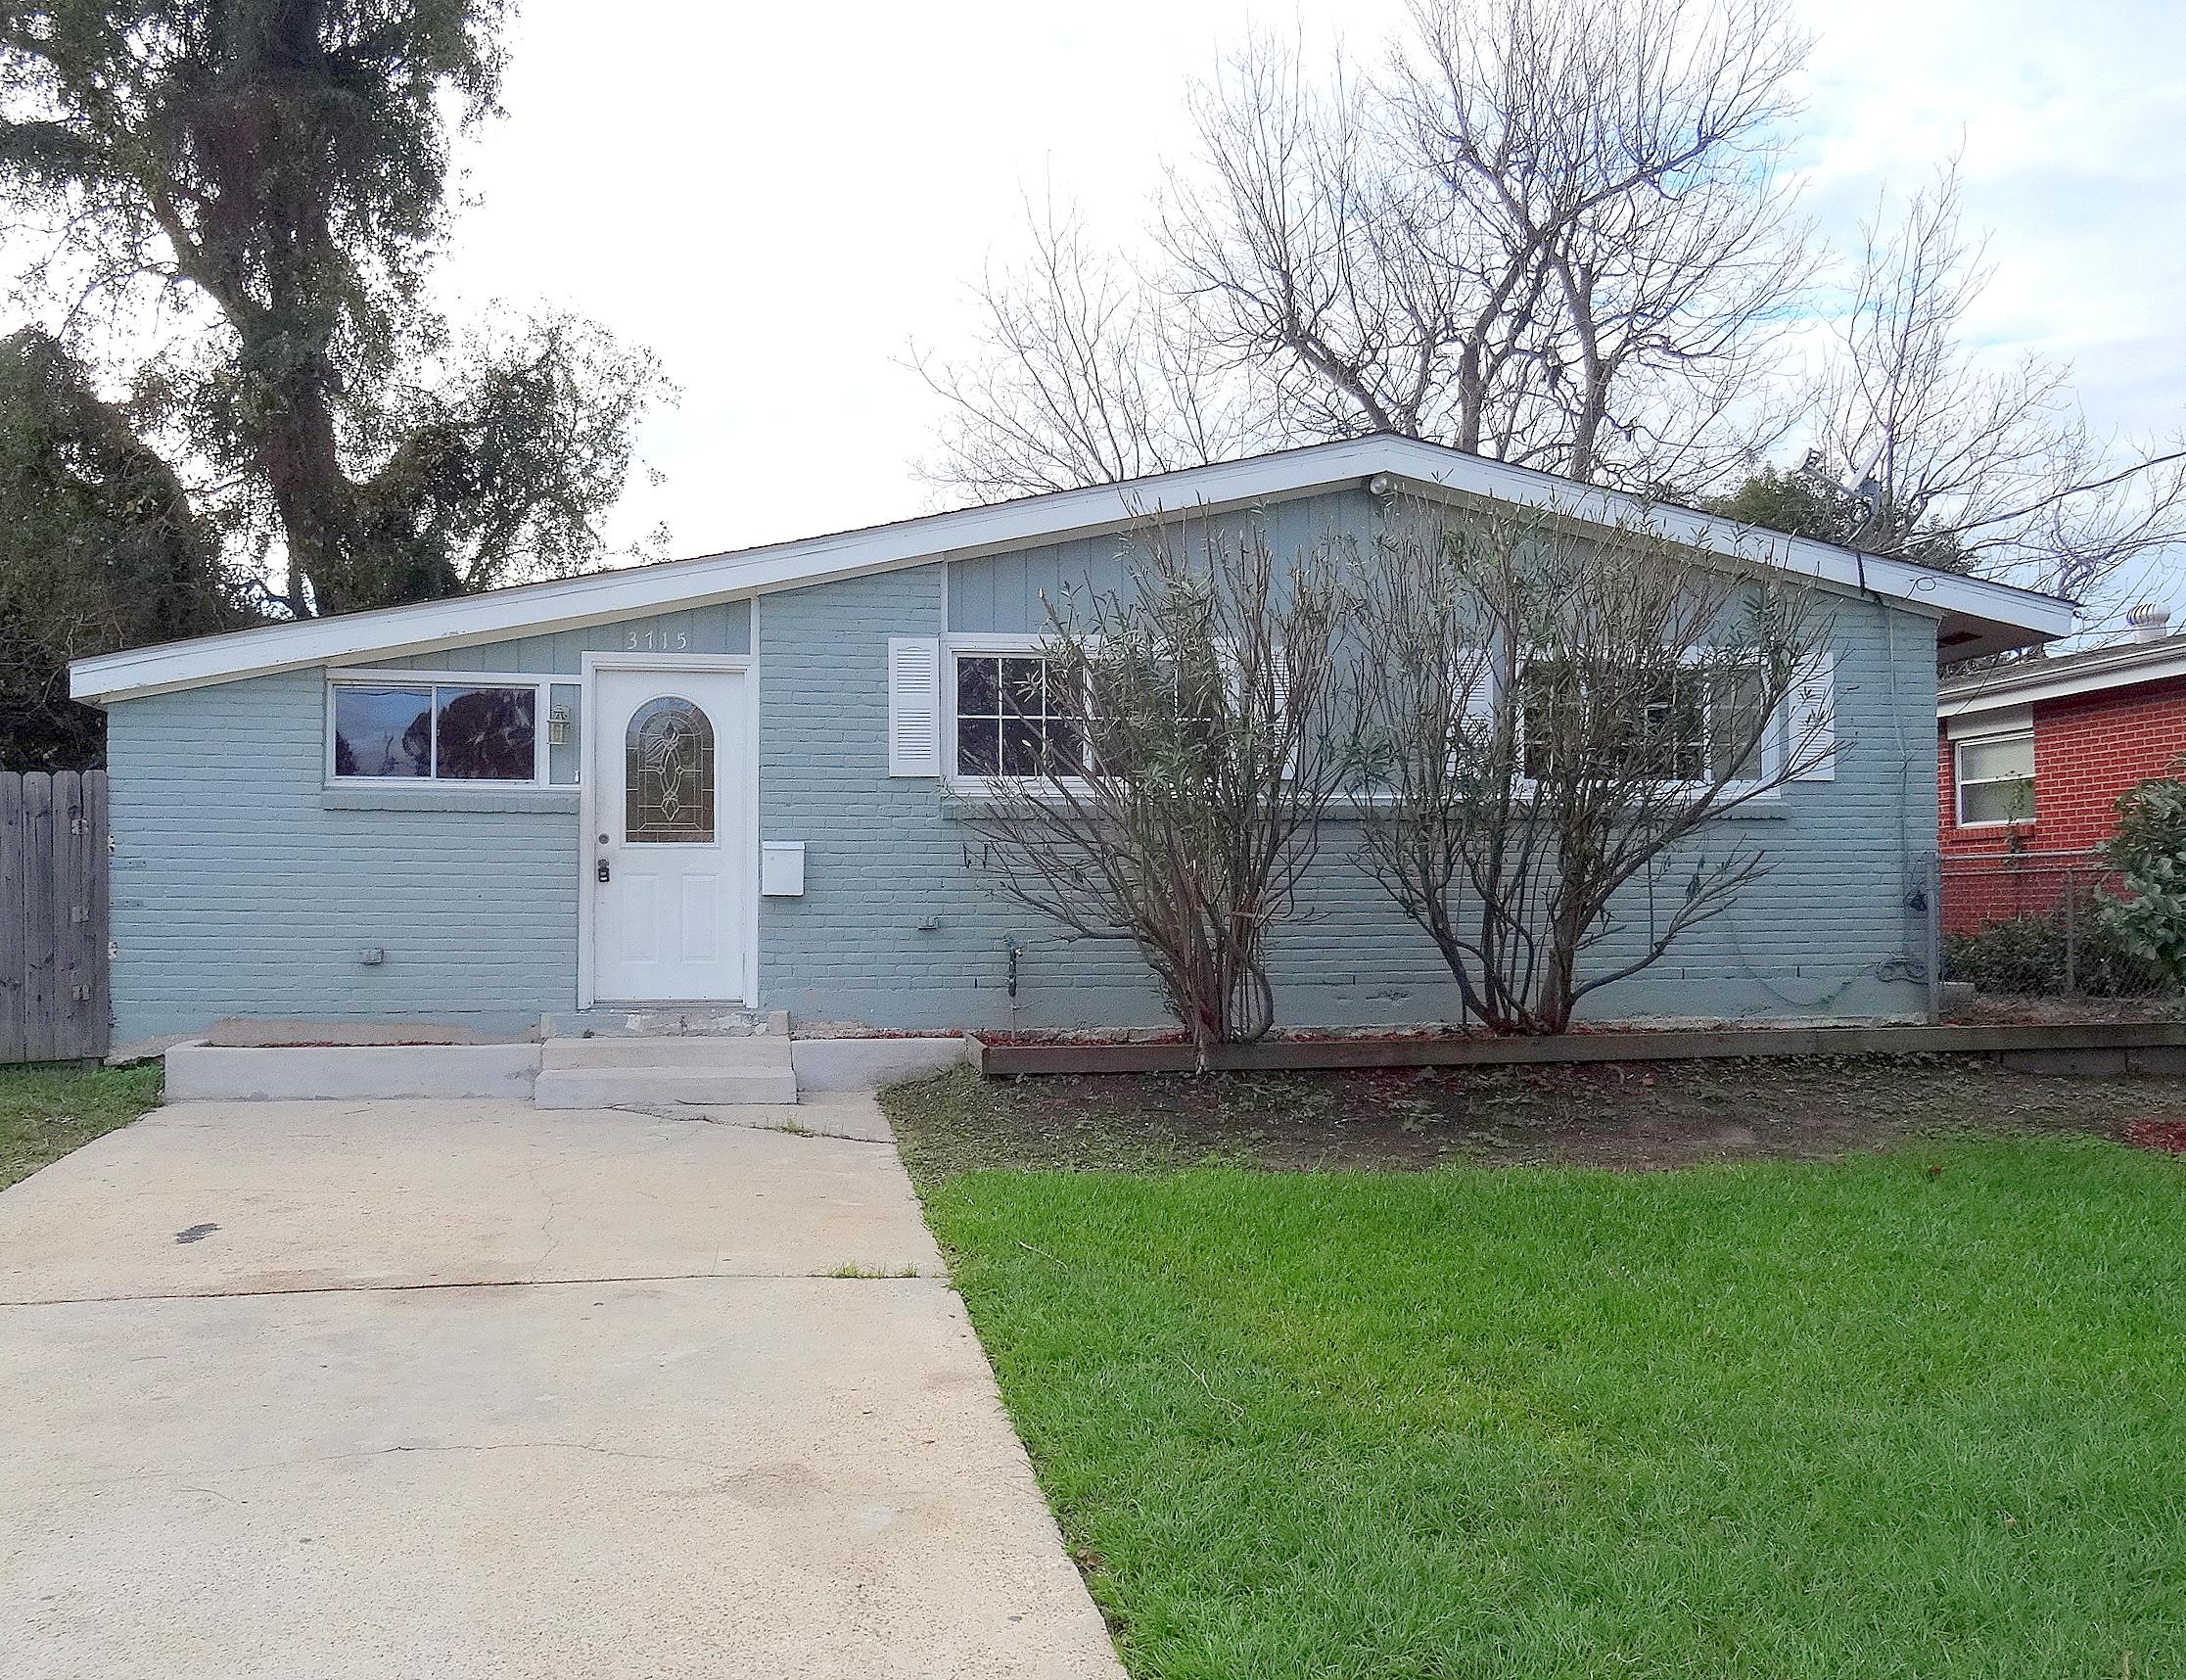 3715 California Av, Kenner, Louisiana 70065